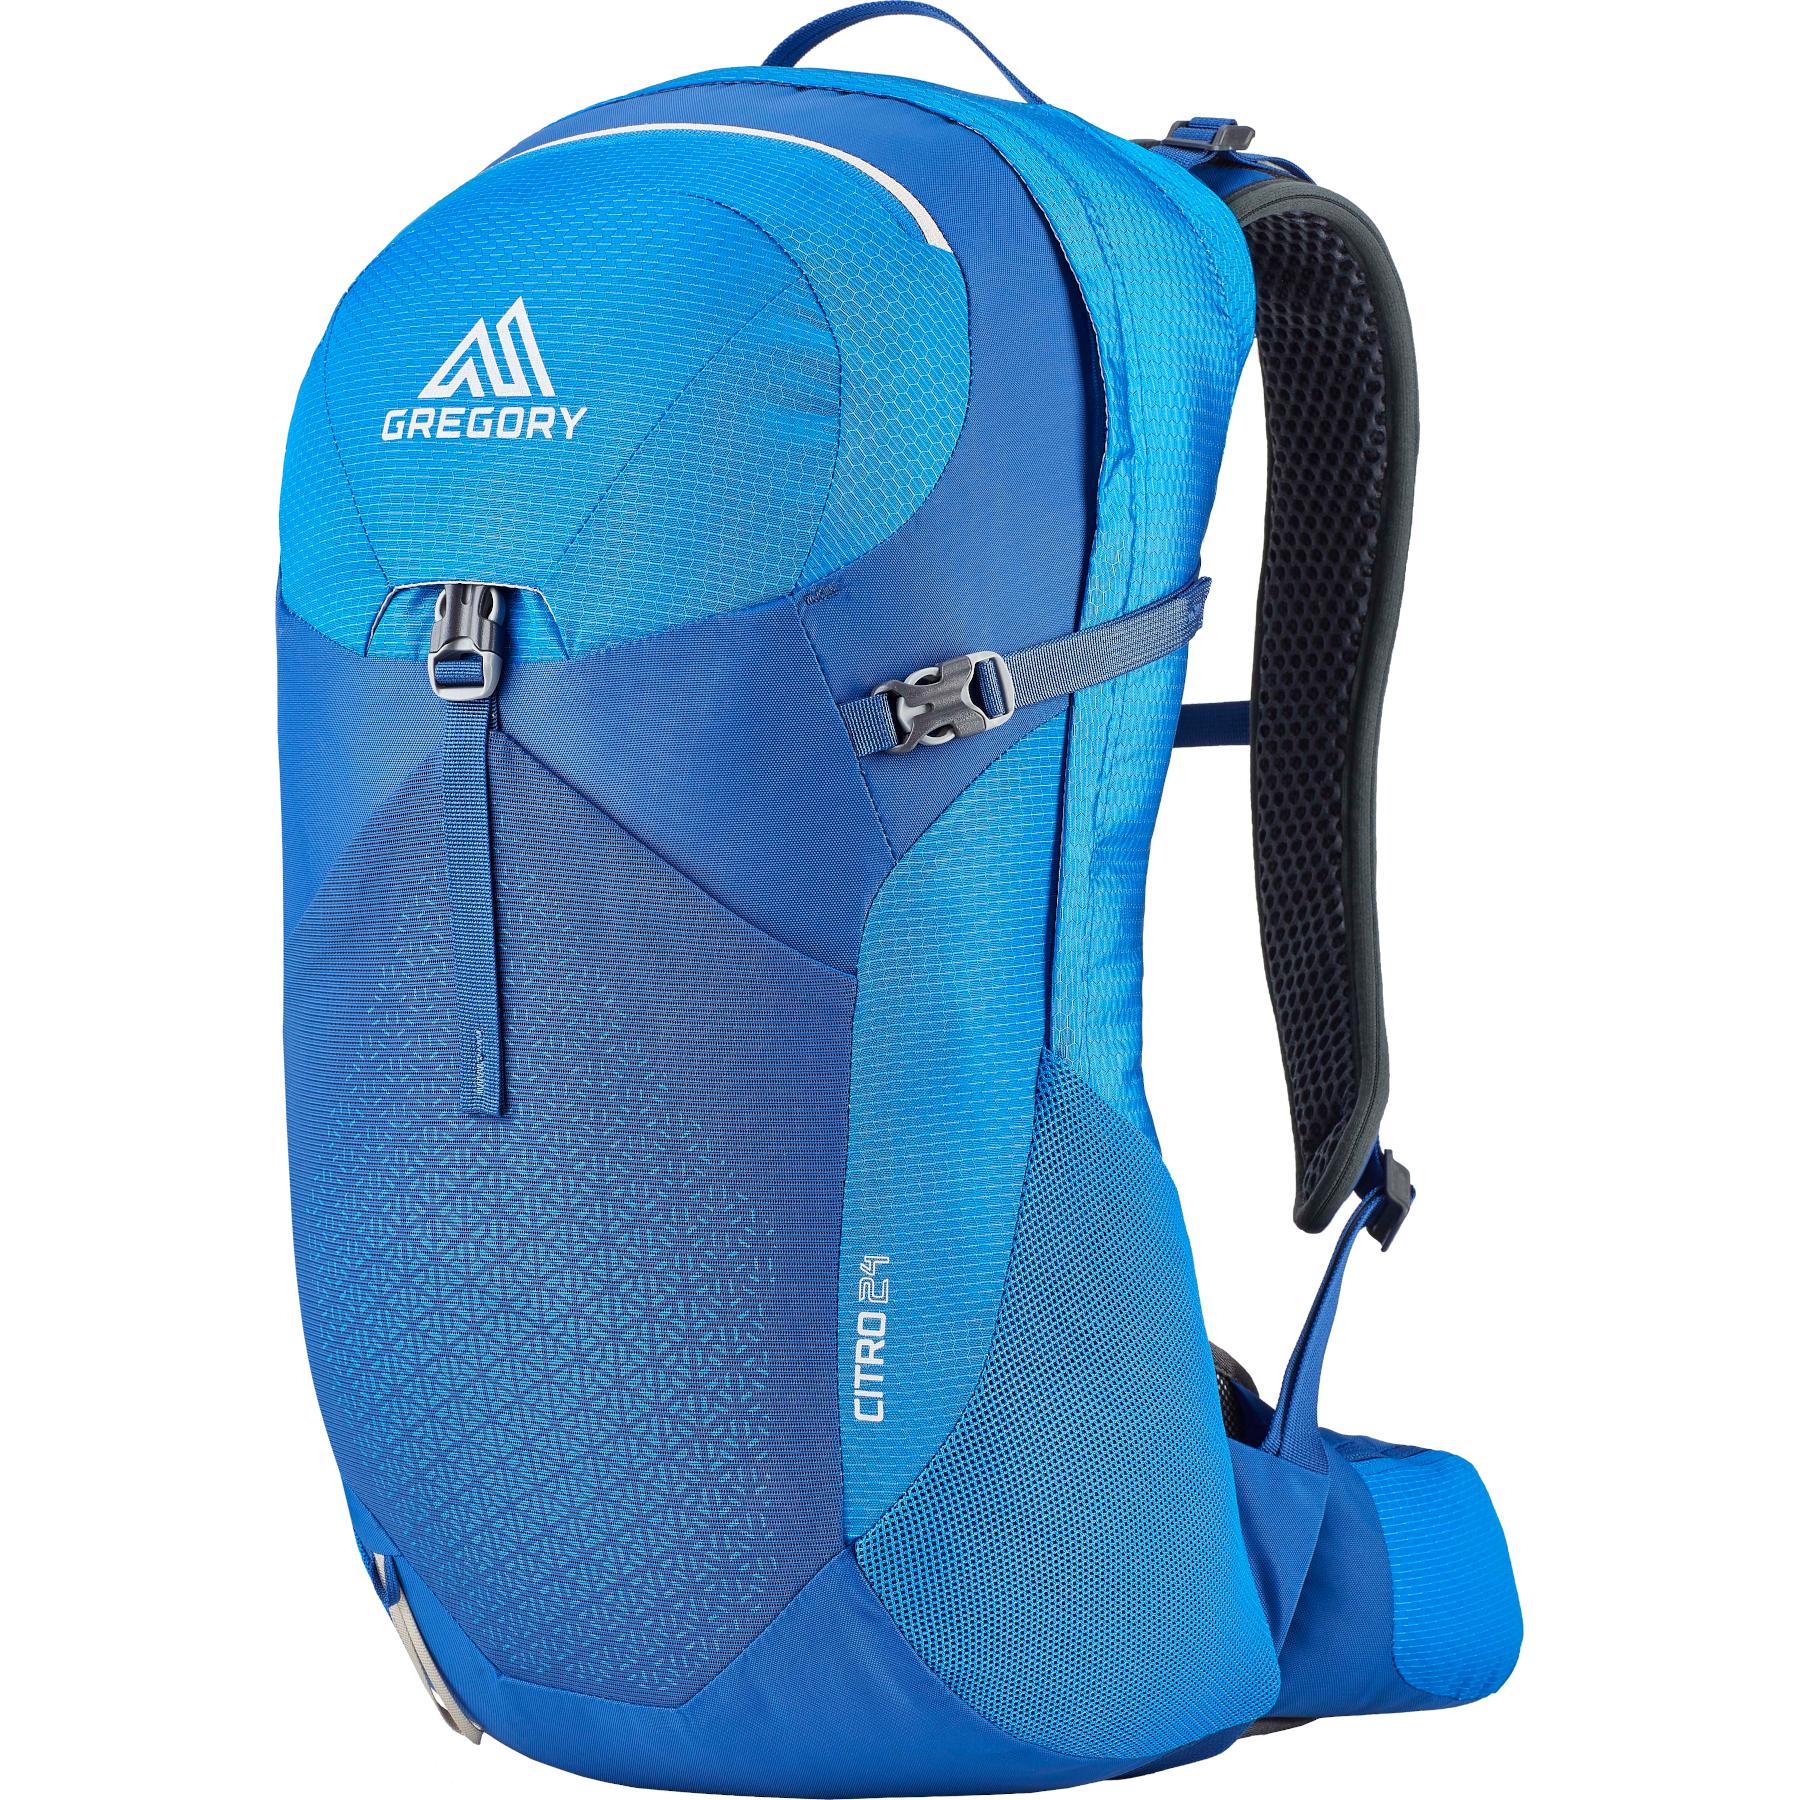 Gregory Citro 24 Backpack - Reflex Blue